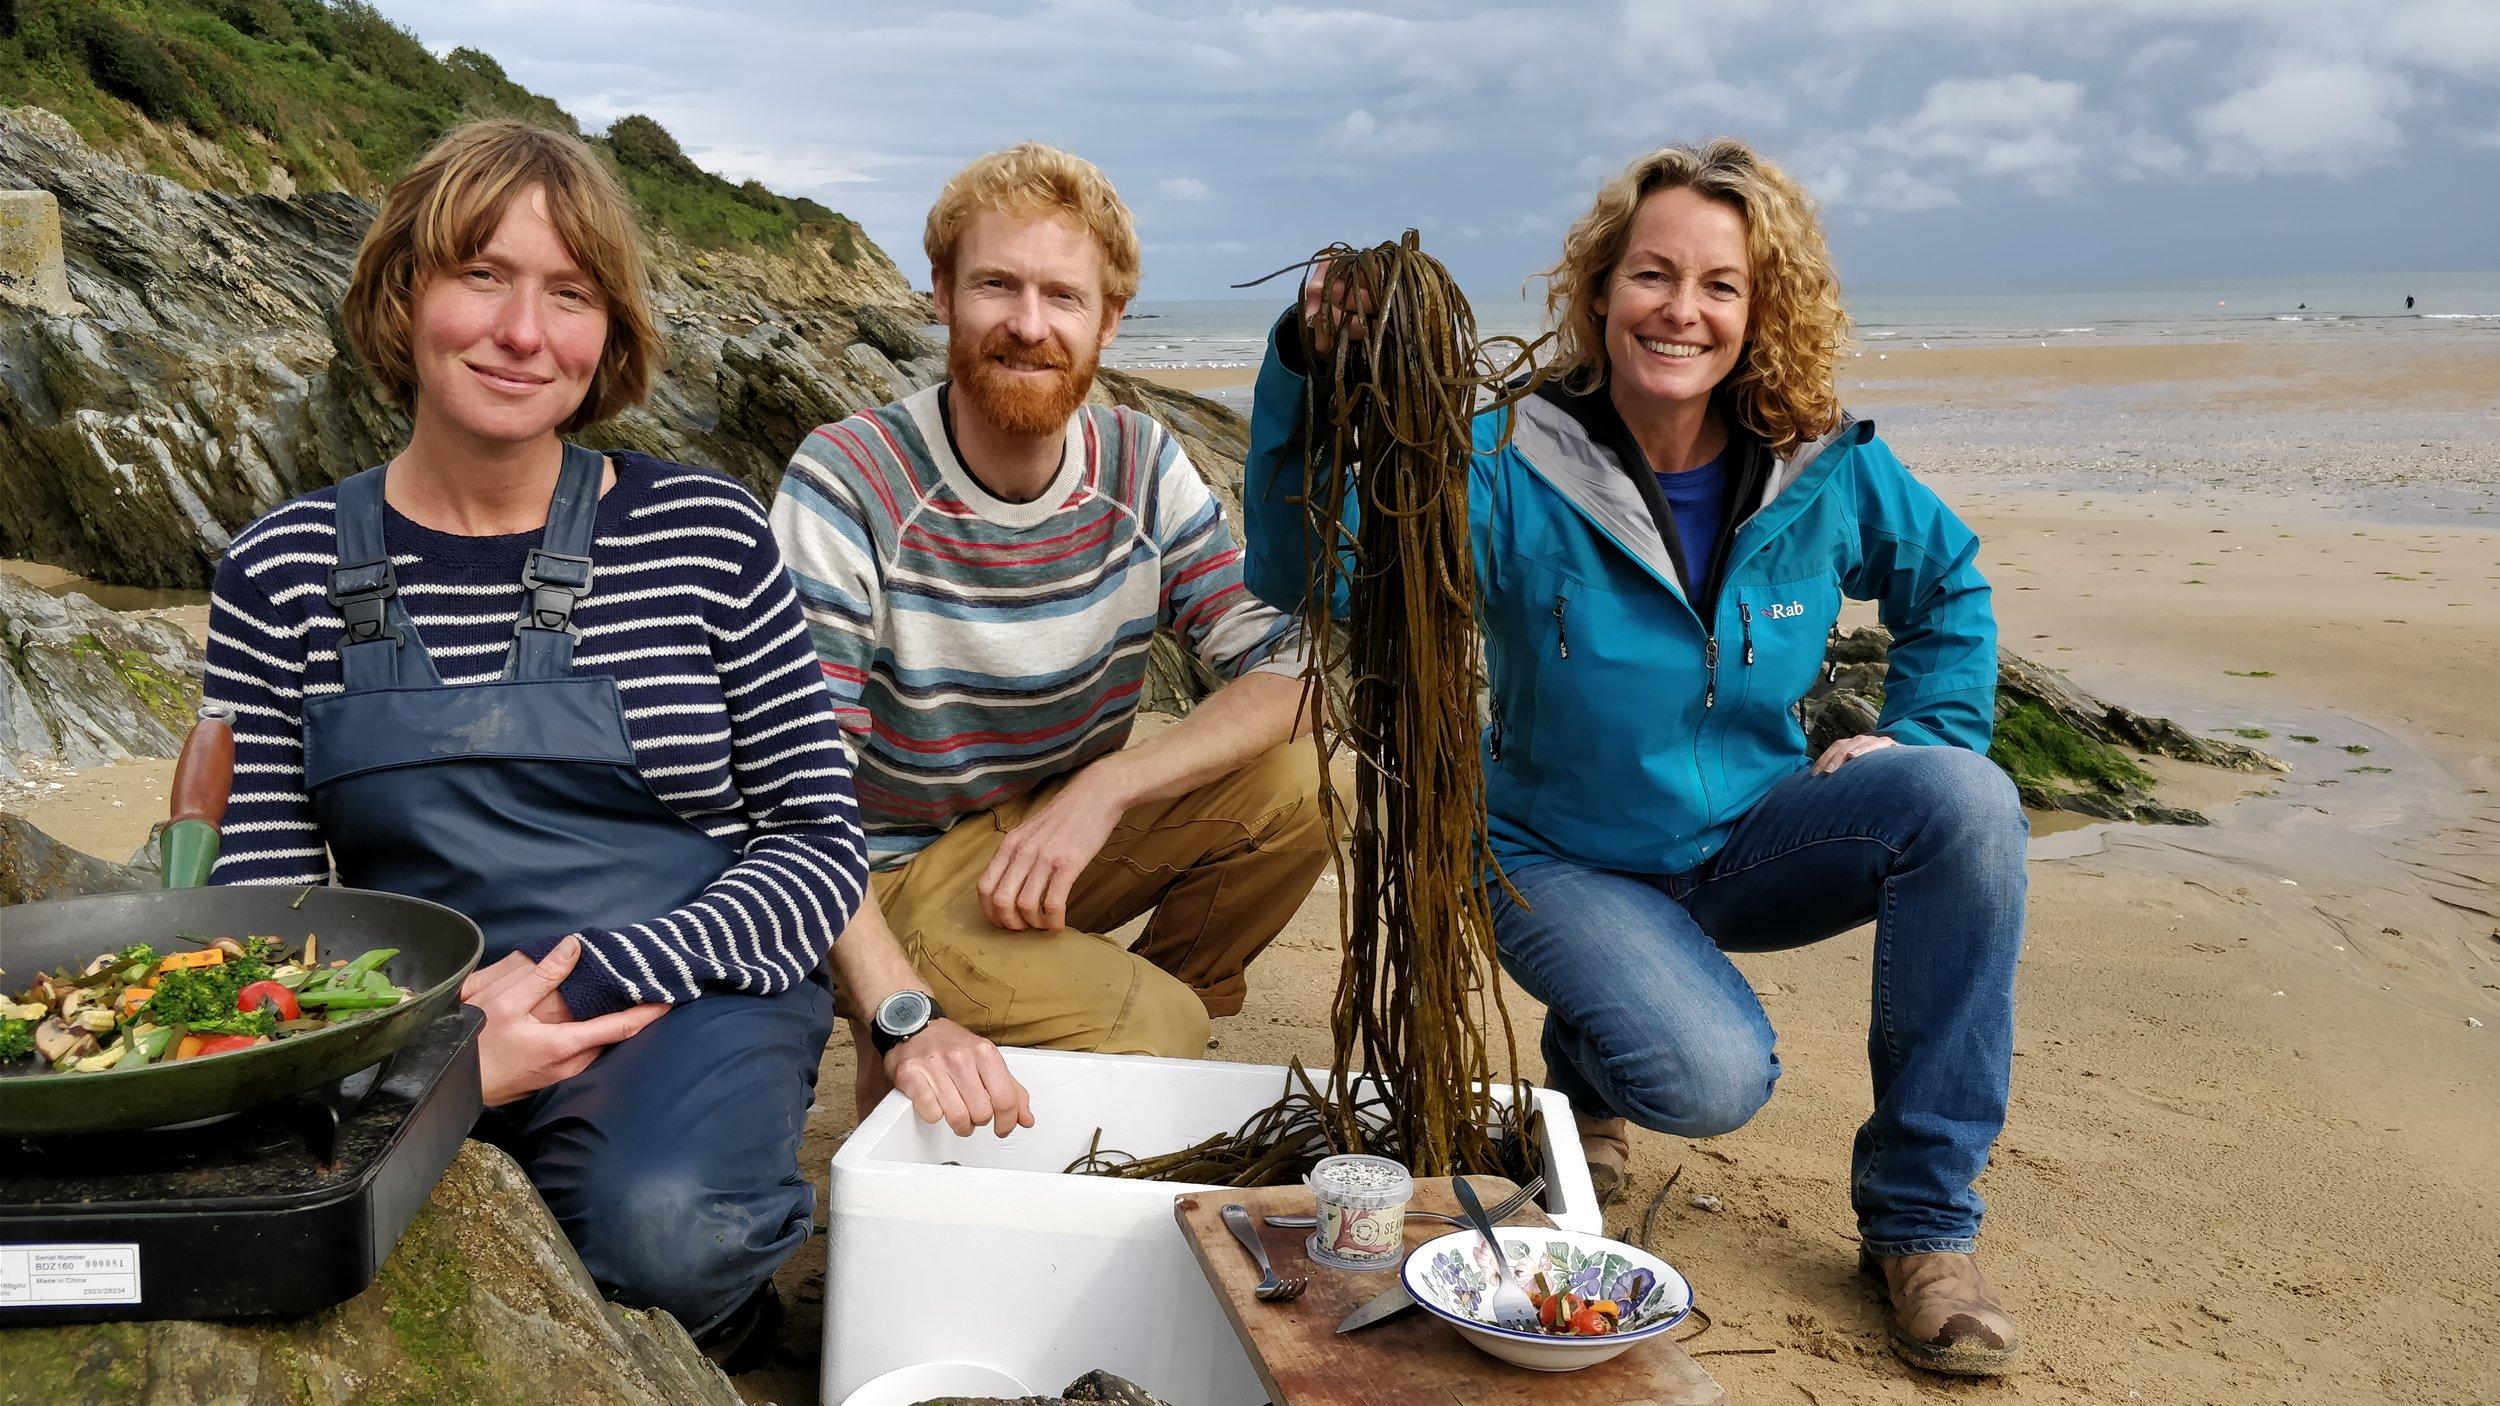 RX01 - Kate with Cornish Seaweed.jpg